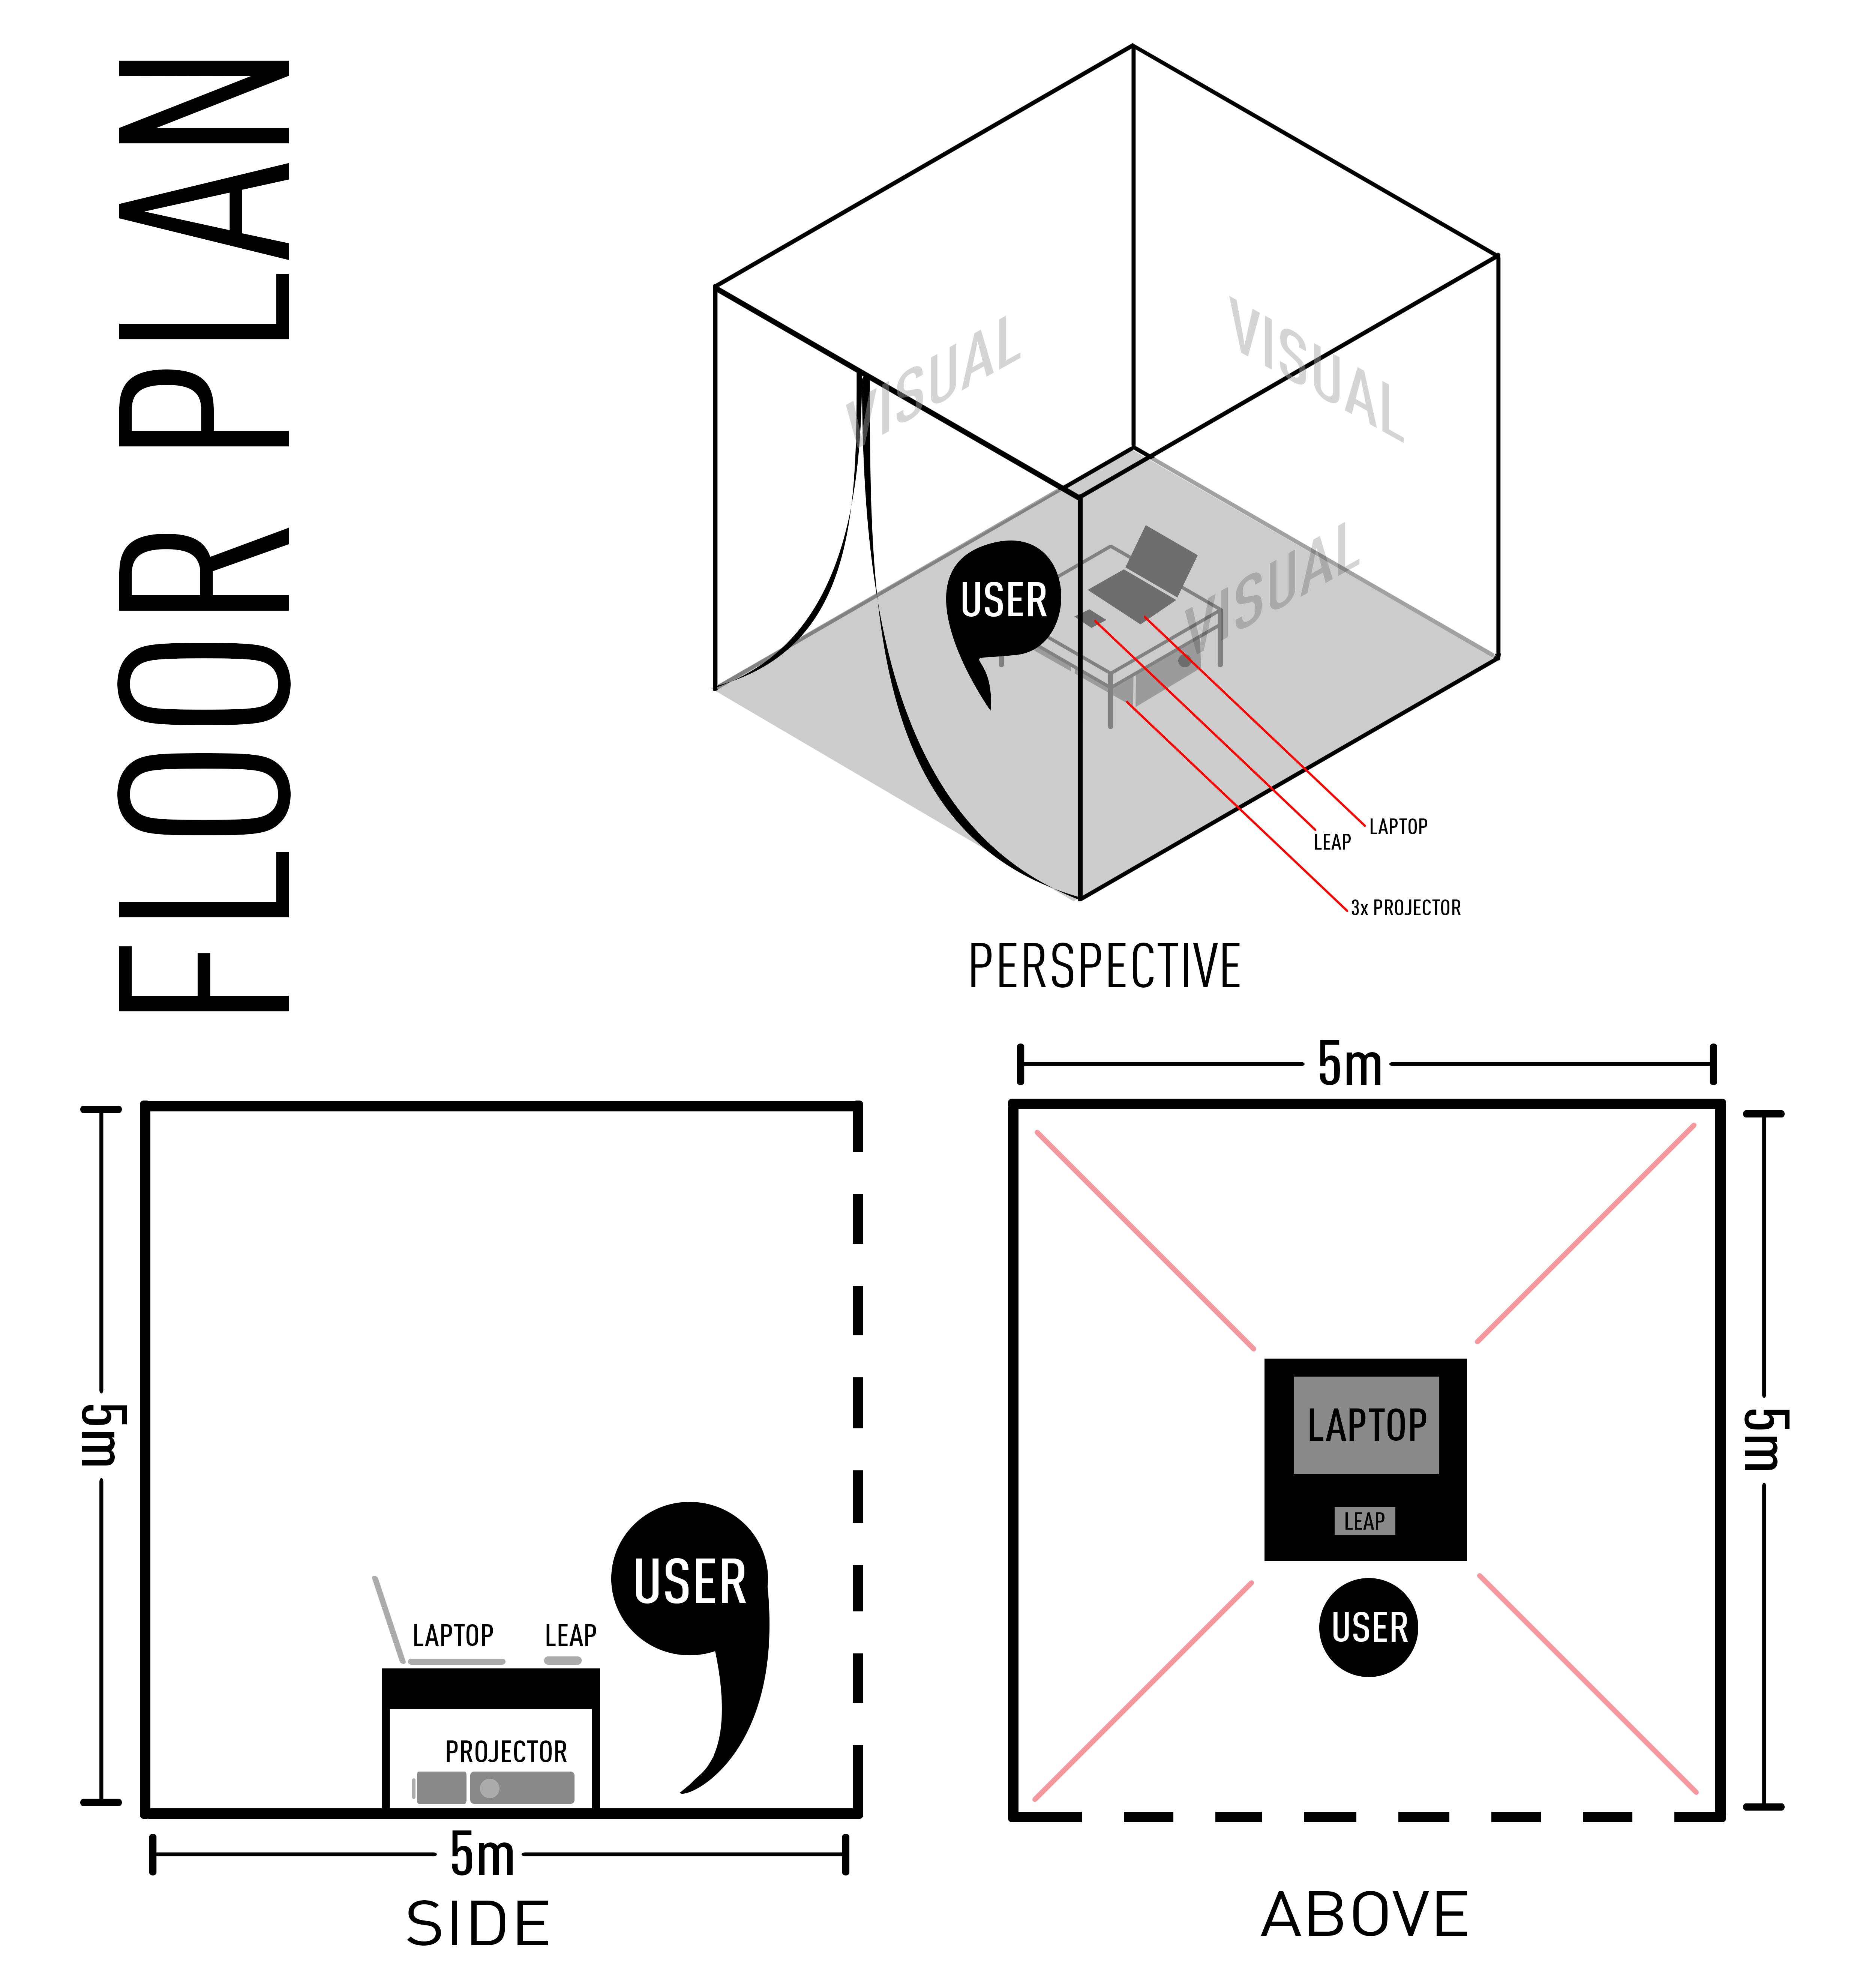 Initial Floorplan